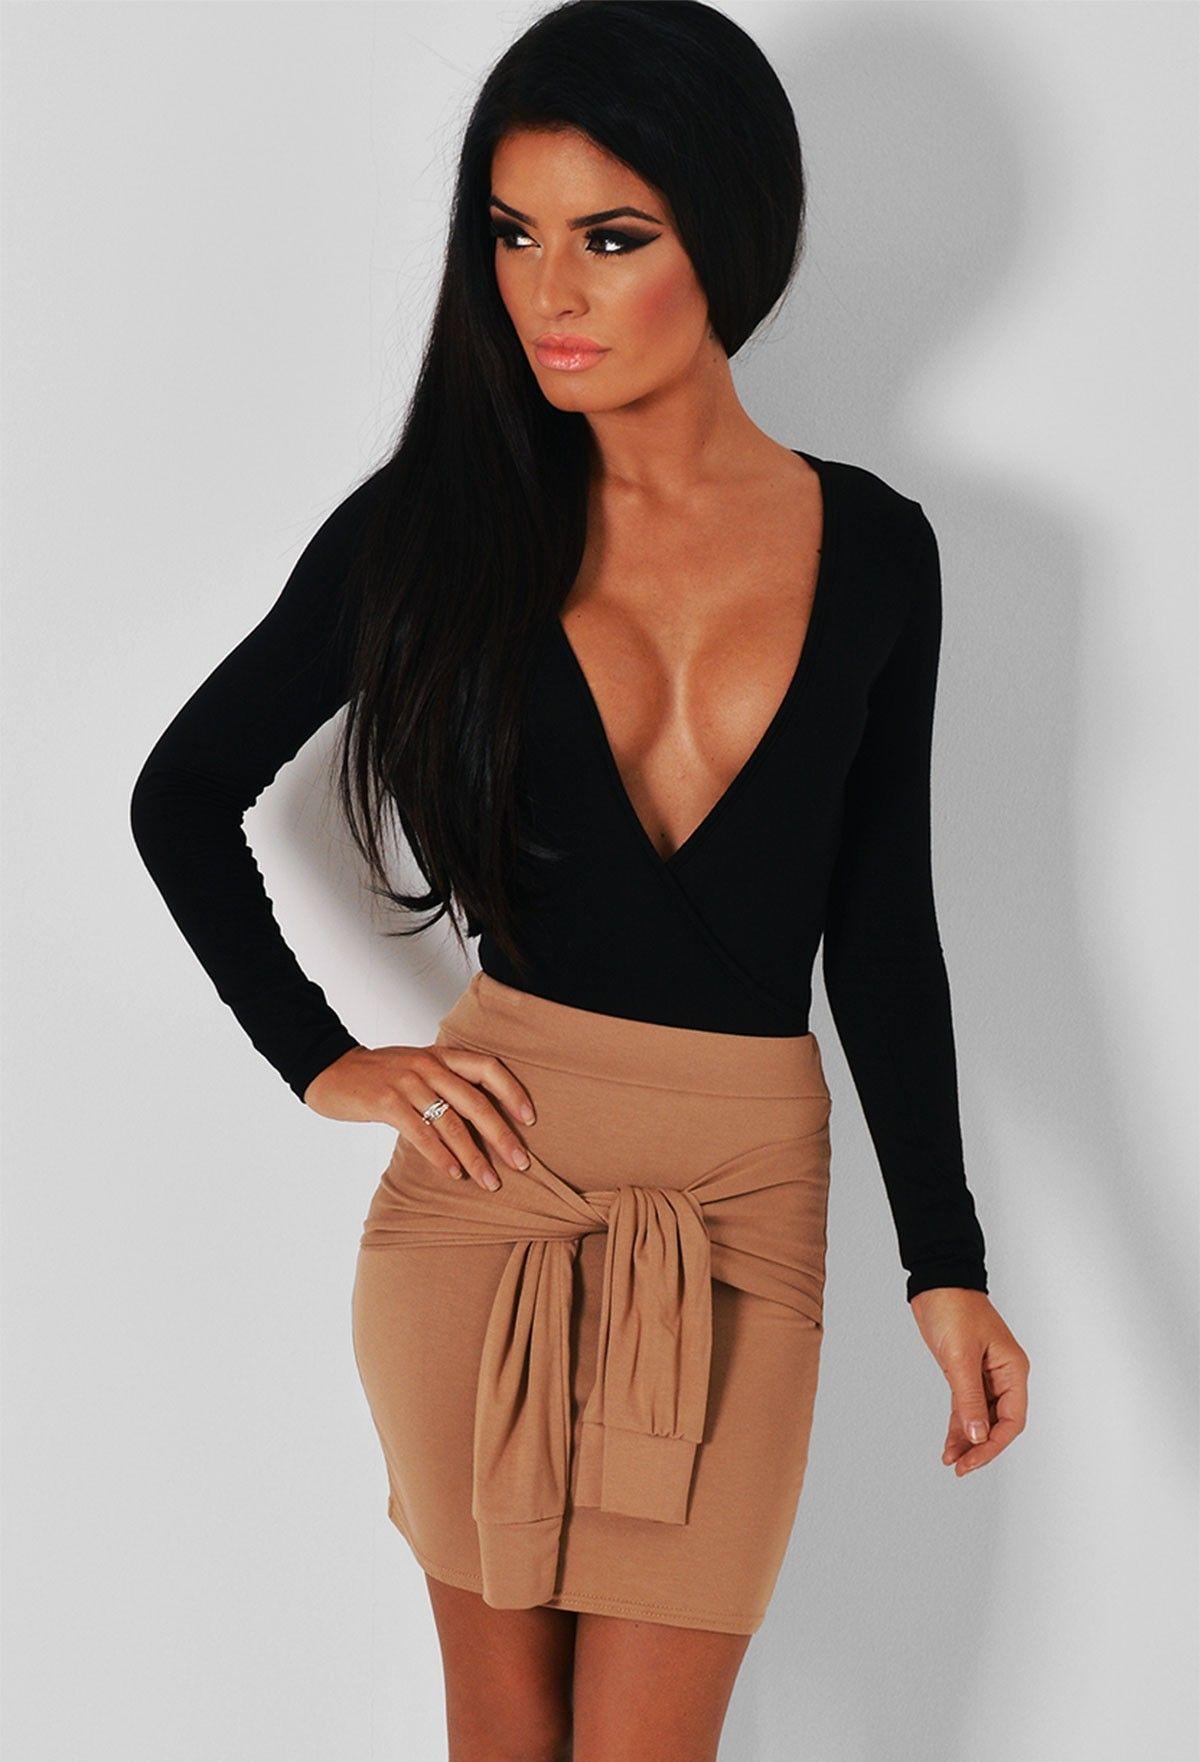 camel tie sleeve skirt - Google Search